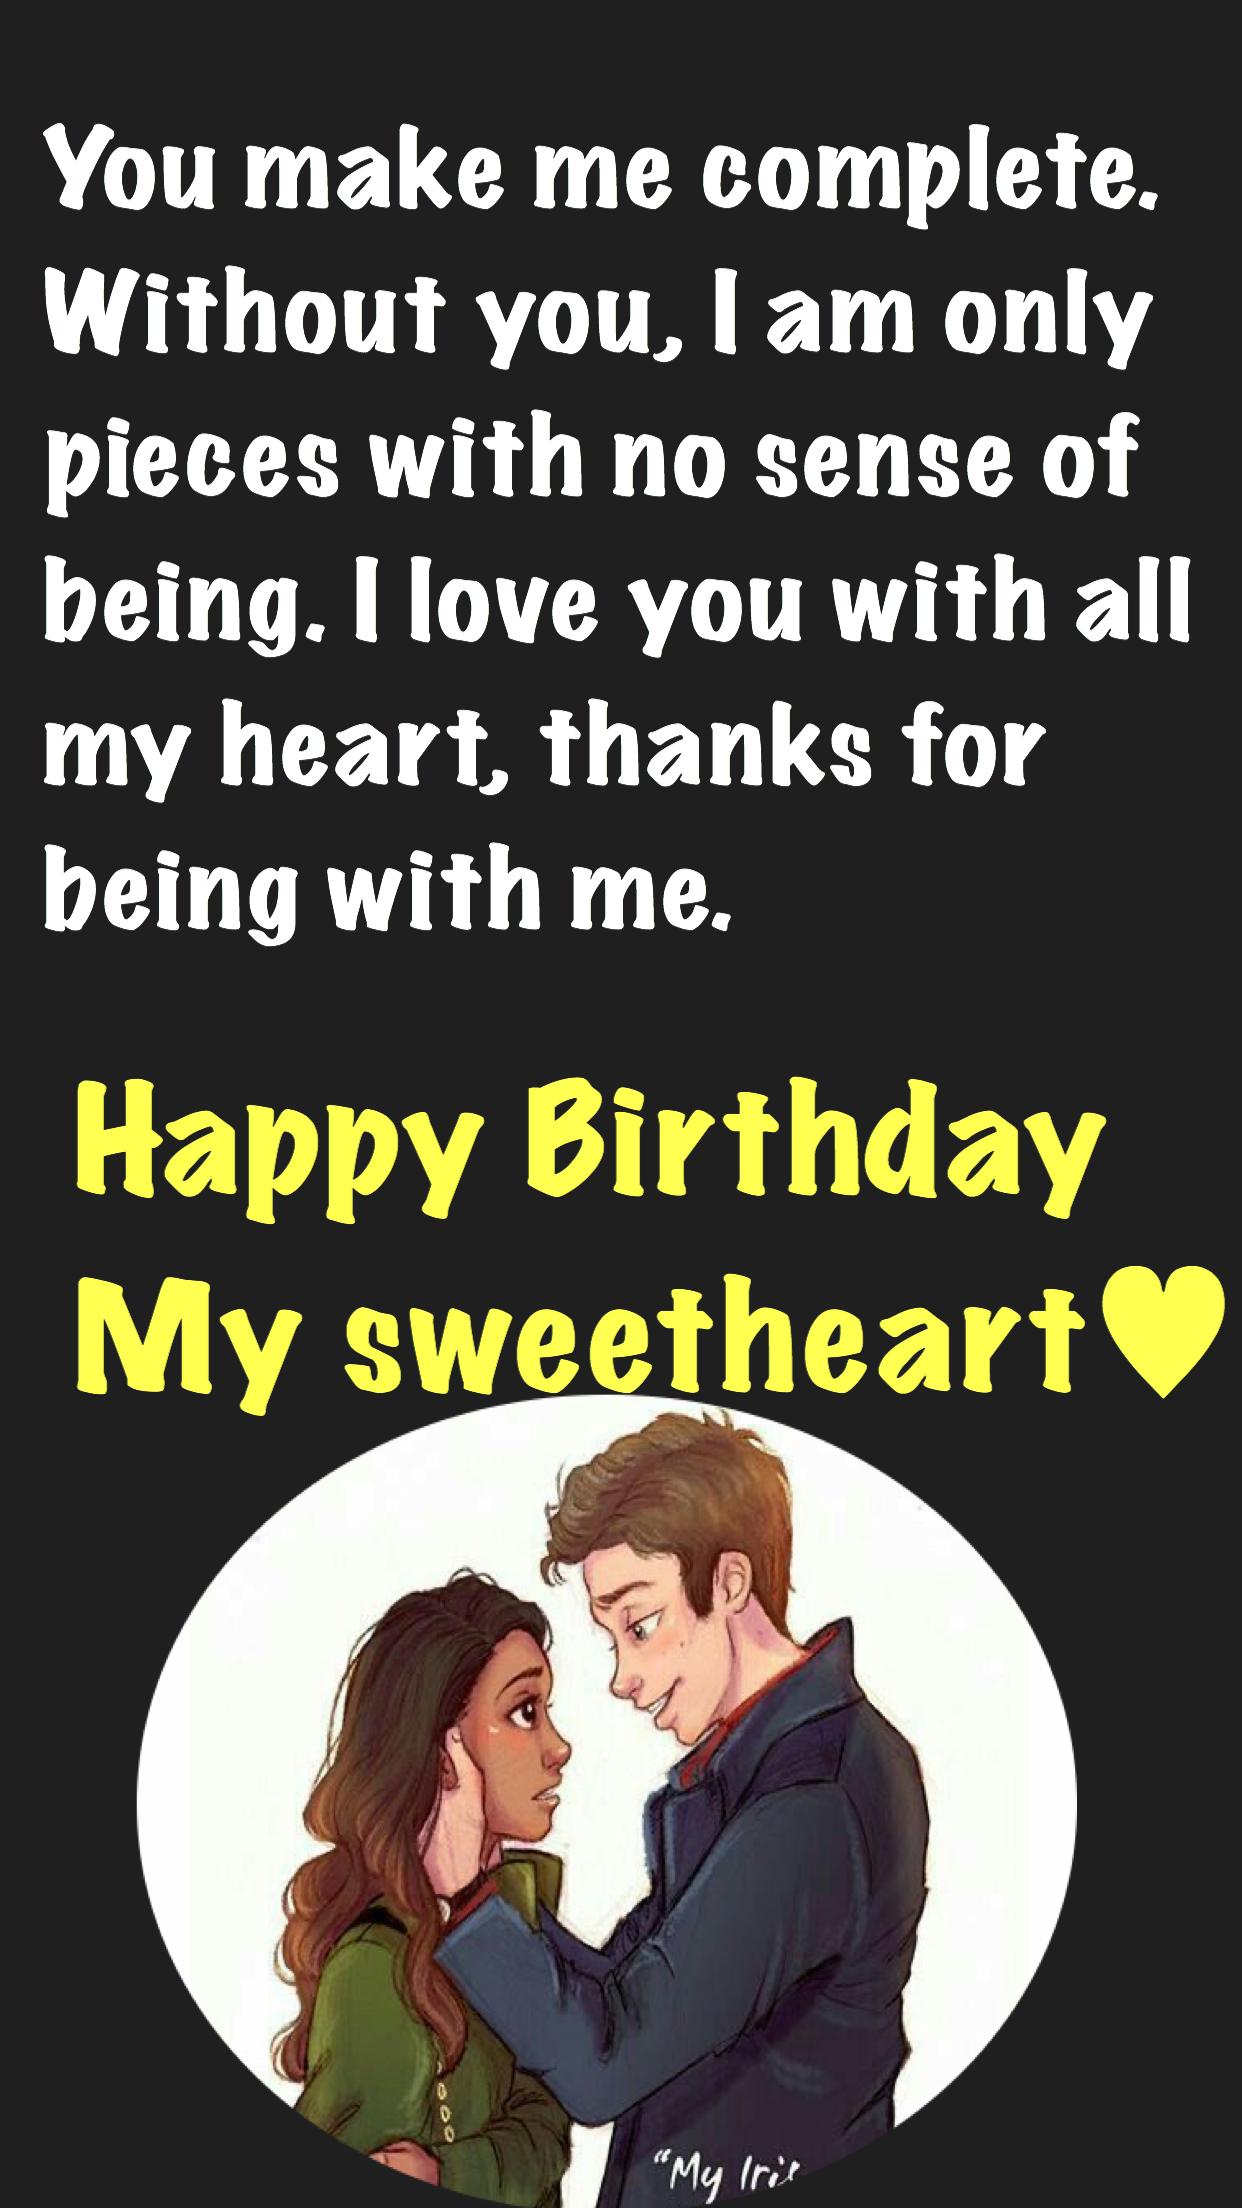 Happy Birthday My Sweetheart Birthday Wishes For Wife Happy Birthday My Wife Happy Birthday Love